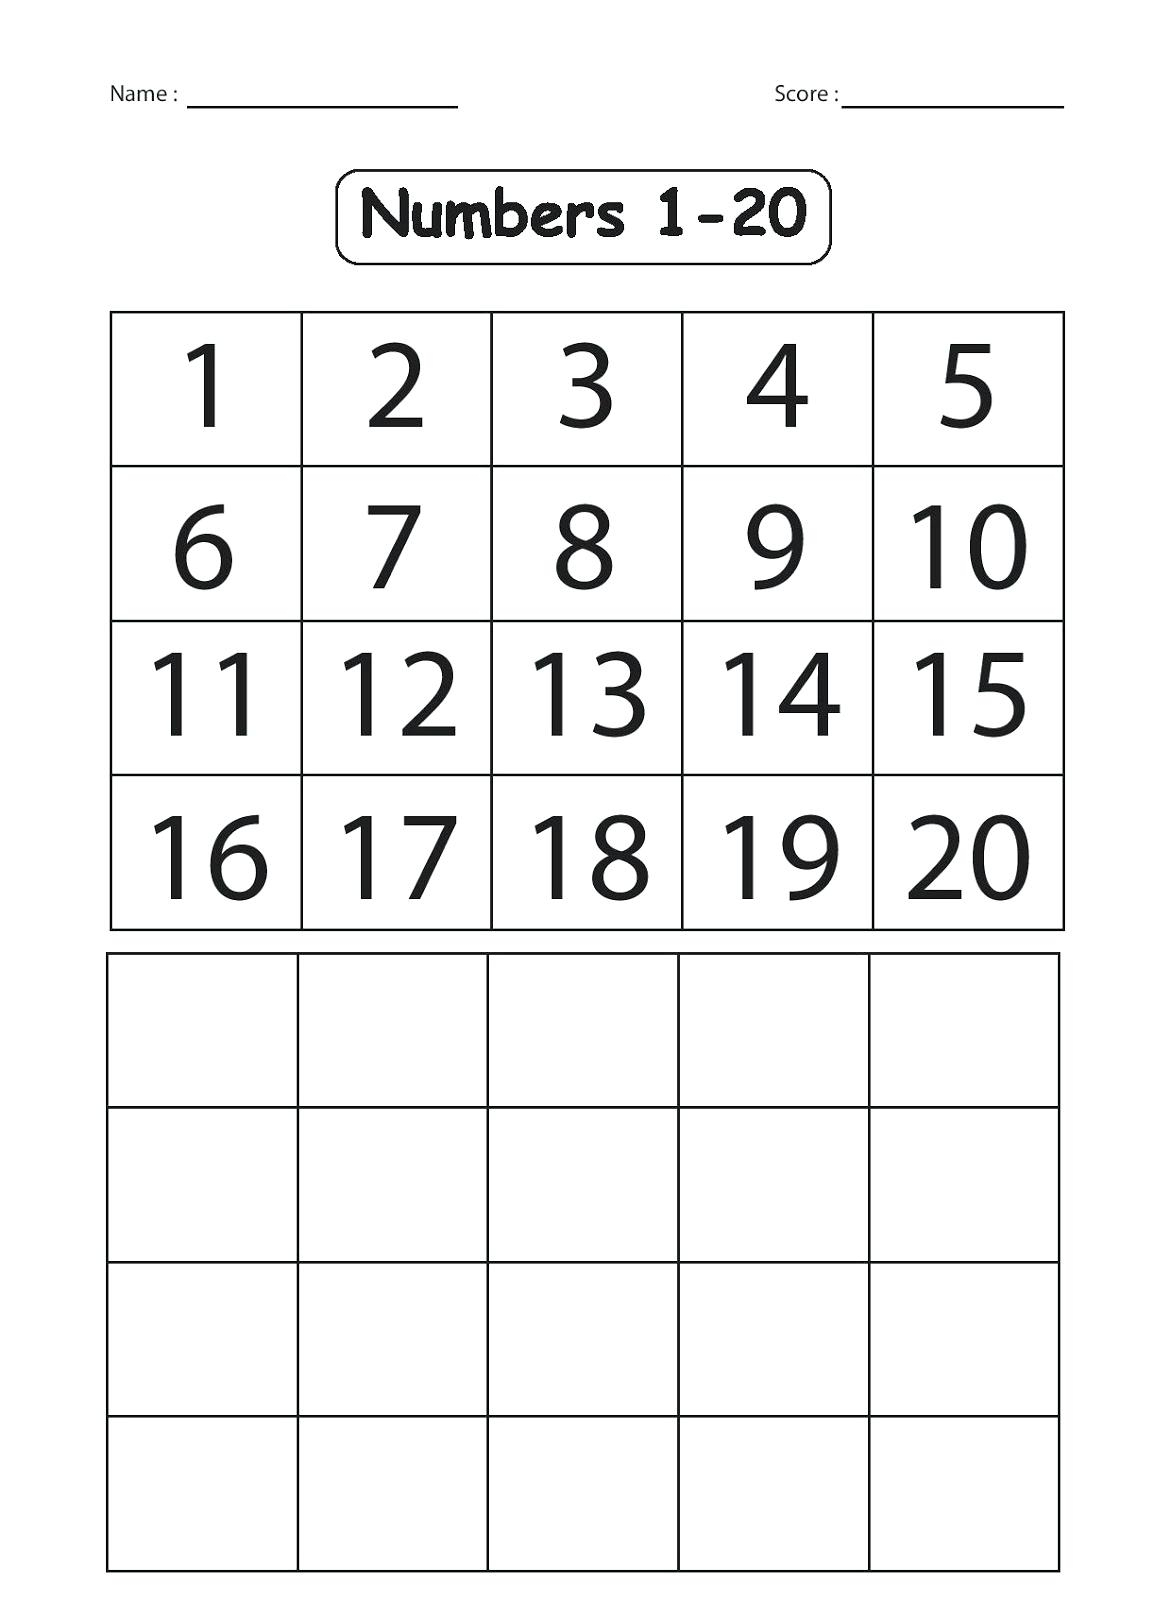 Kindergarten Number Worksheets 1 20 Worksheets Numbers 1 For - Free   Free Printable Counting Worksheets 1 20